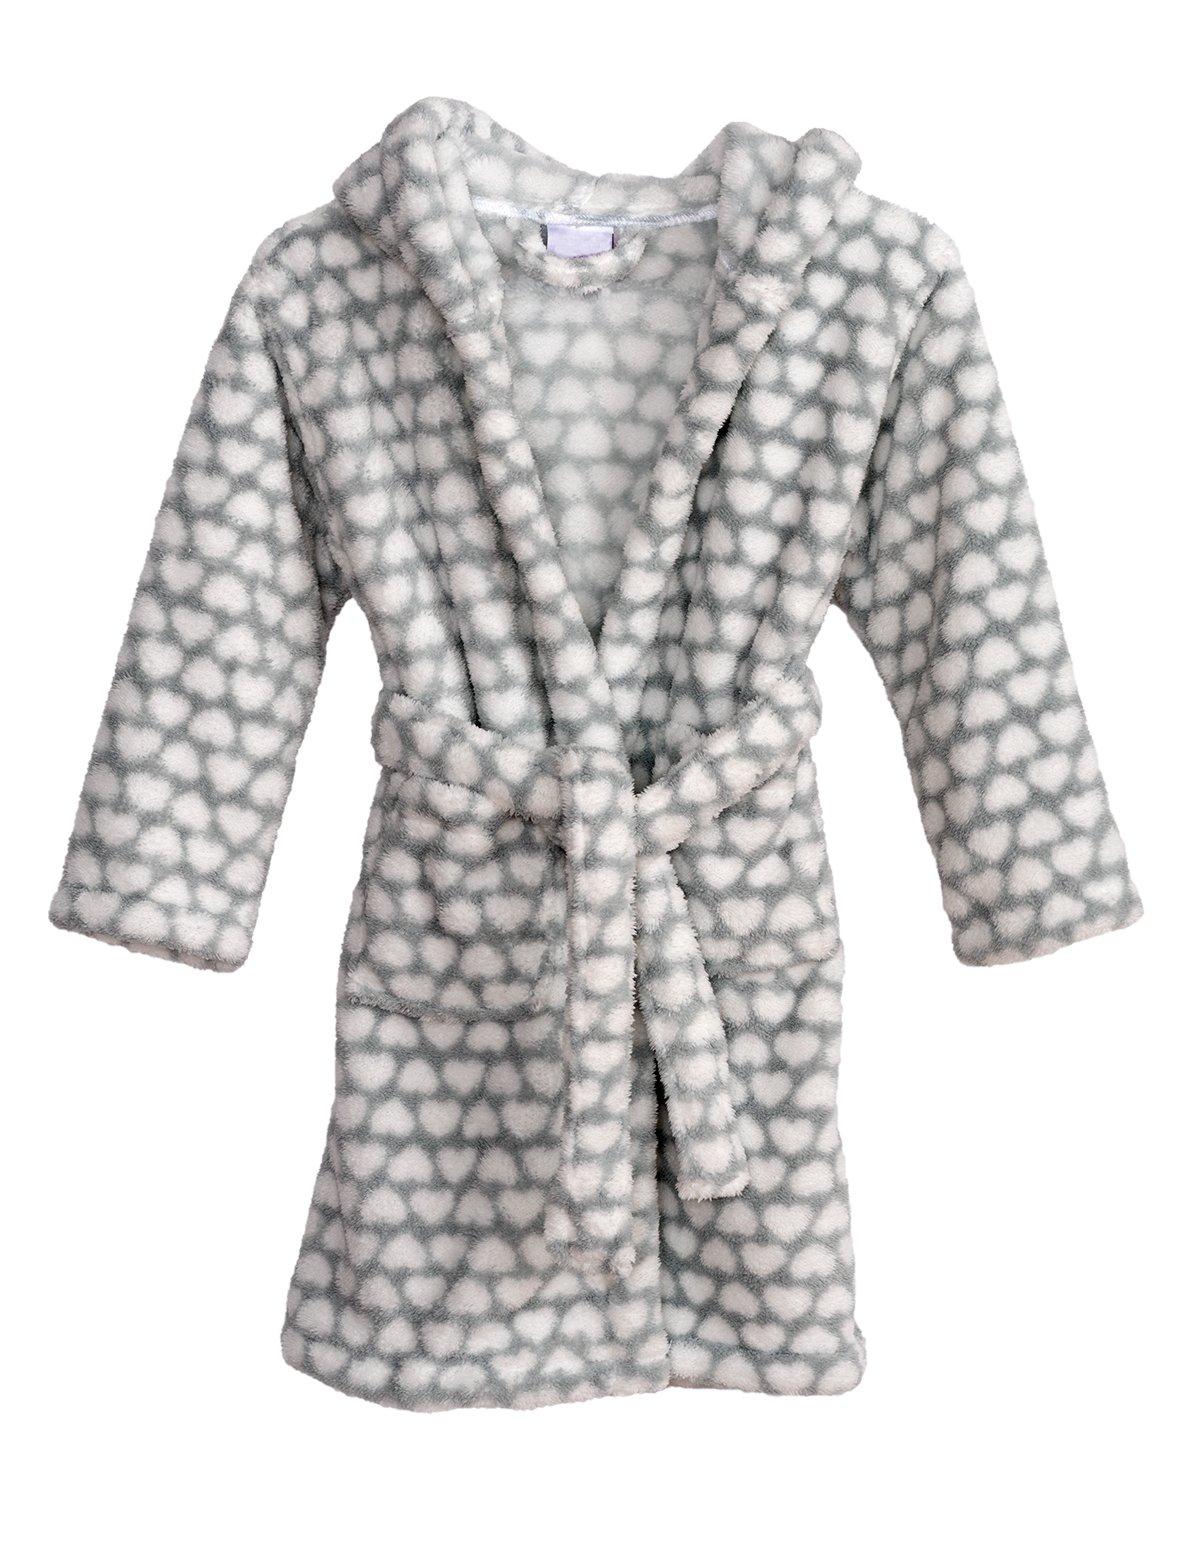 TowelSelections Big Girls' Robe, Kids Plush Hooded Fleece Bathrobe Size 14 Gray/Hearts